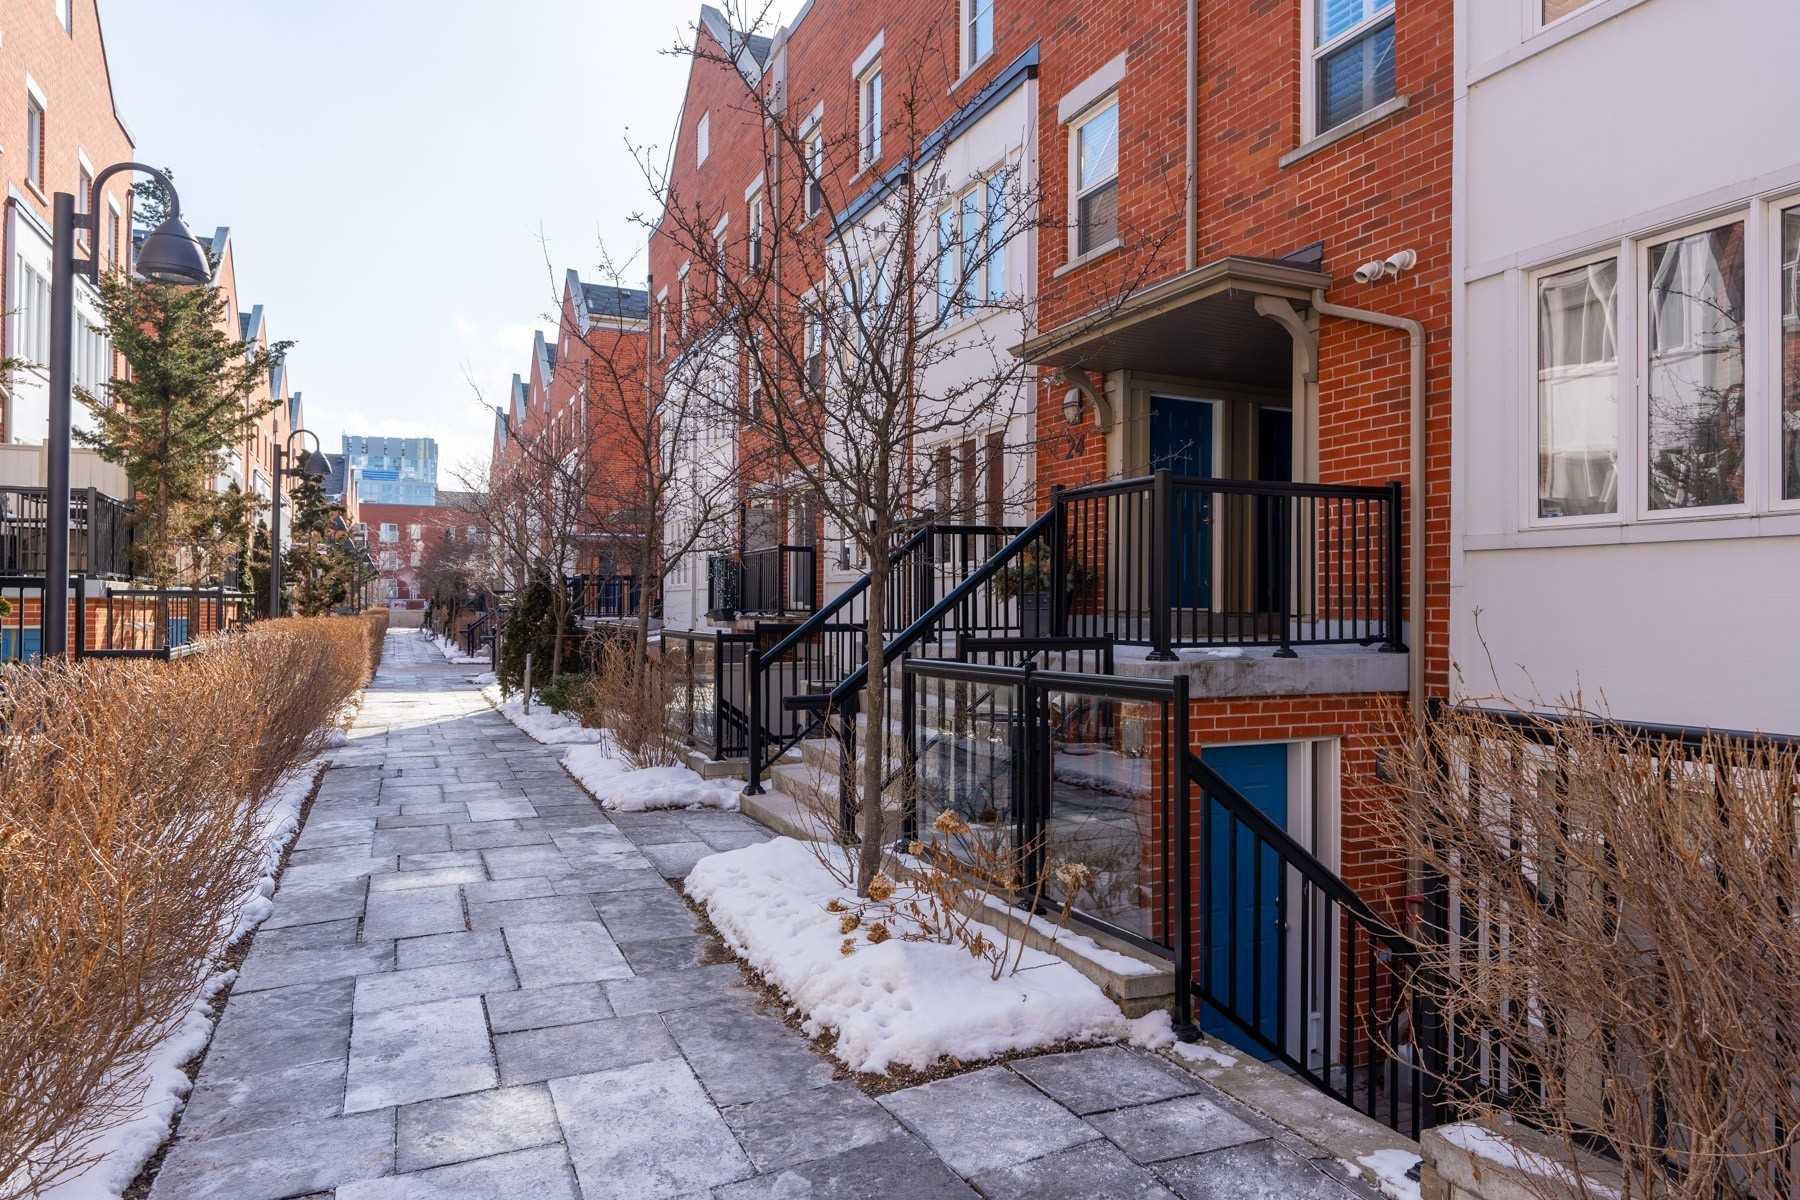 Main Photo: 8 24 Florence Wyle Lane in Toronto: South Riverdale Condo for sale (Toronto E01)  : MLS®# E4701269